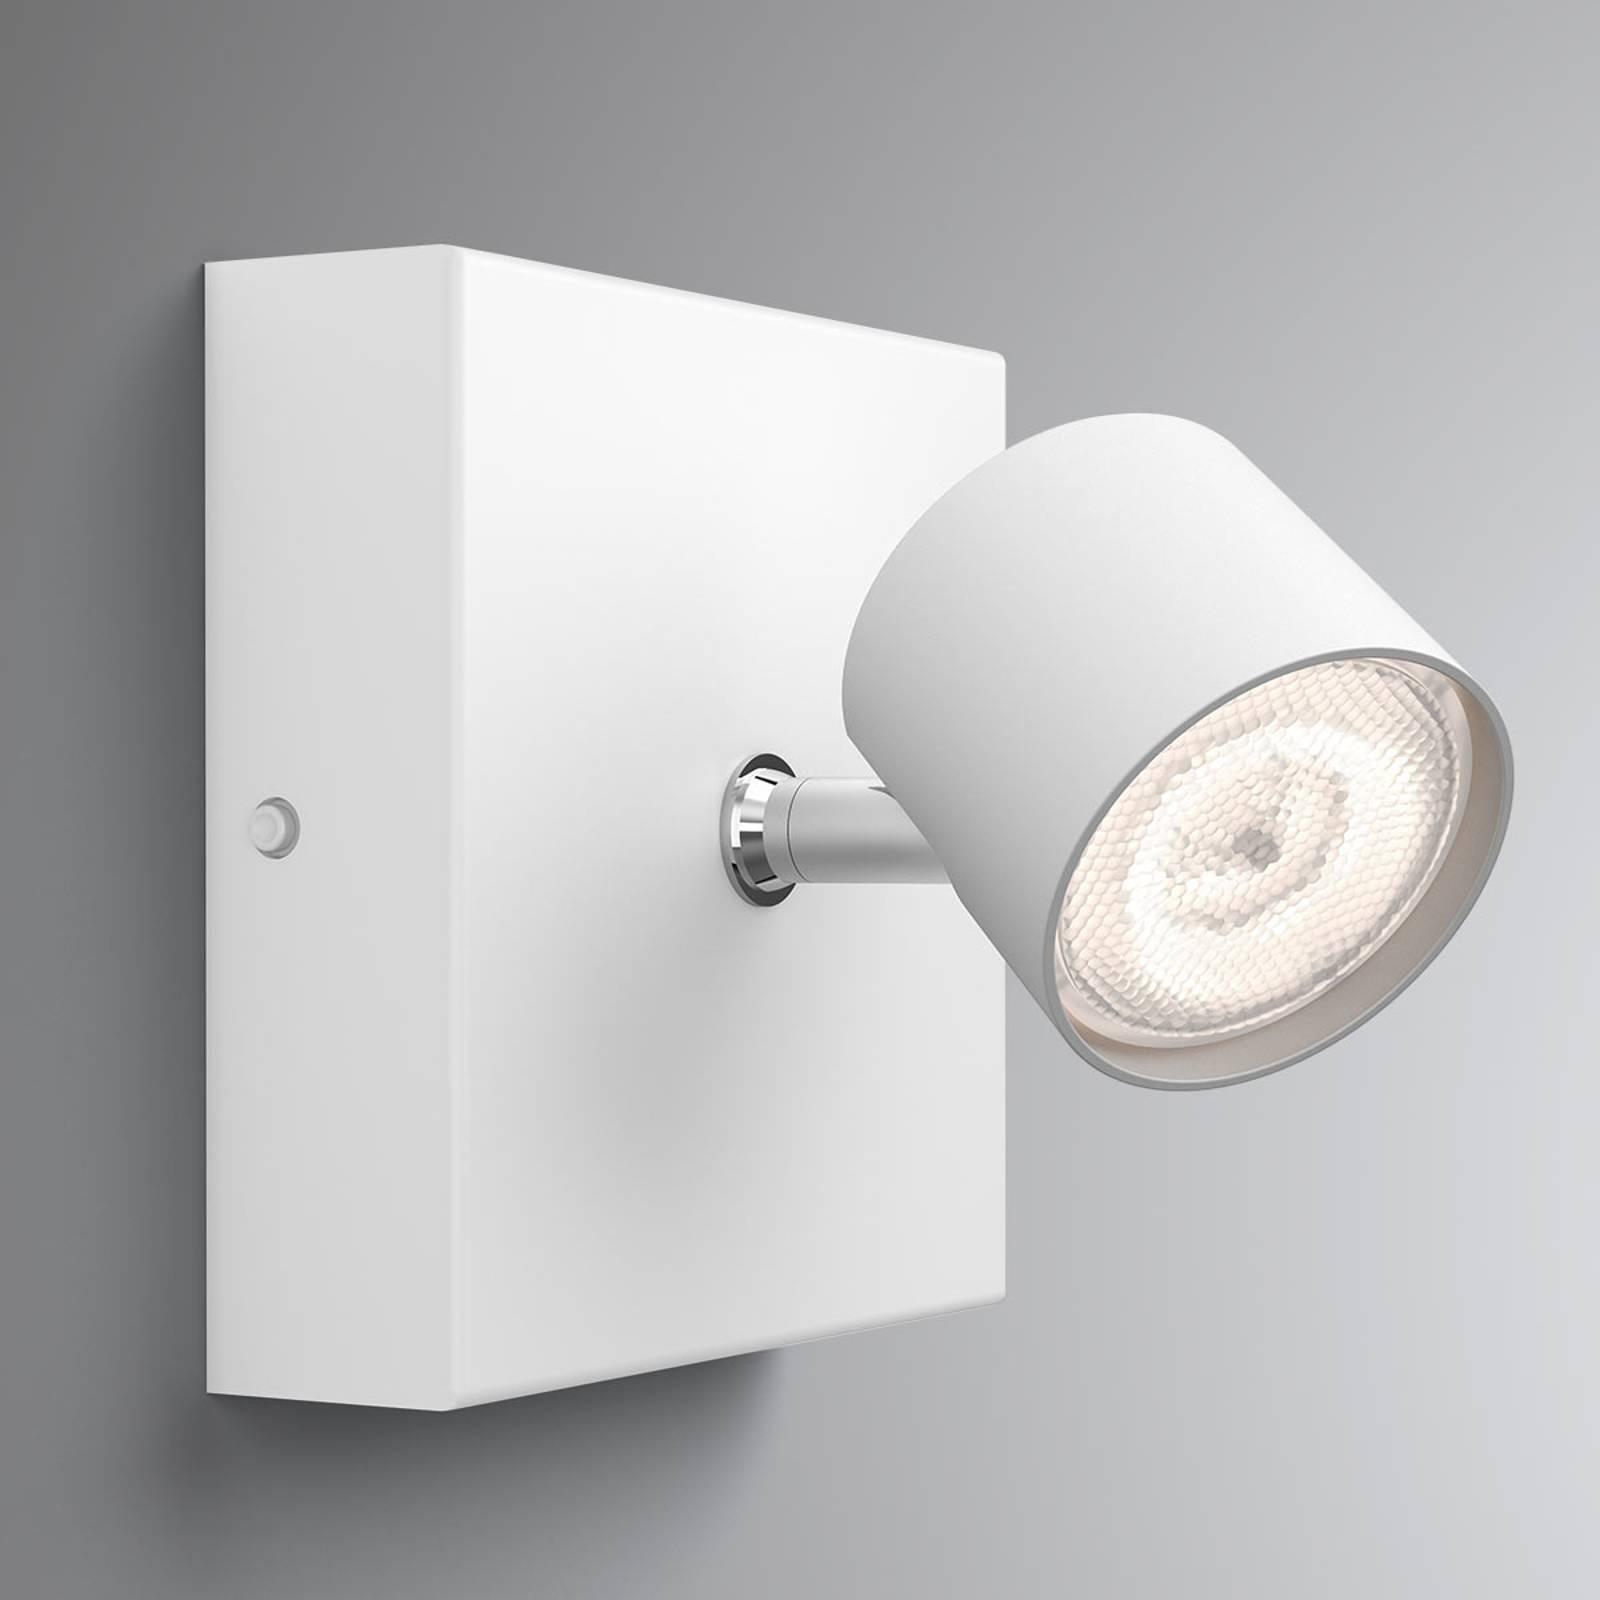 Star - Dimbare LED spot met warmglow effect